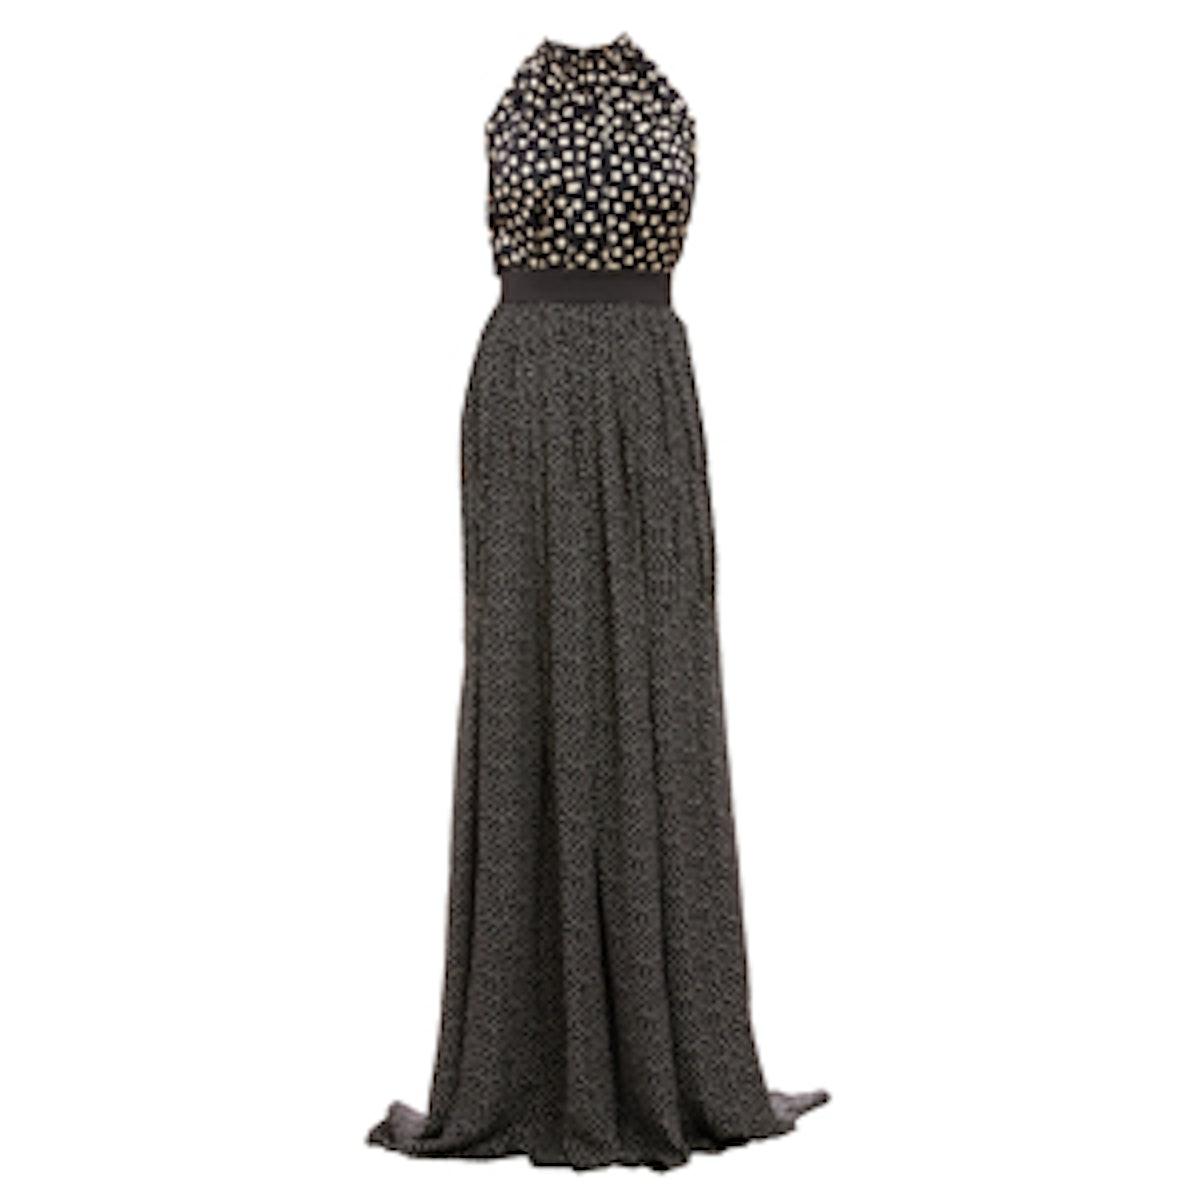 Mixed Dot-Print Halter Gown